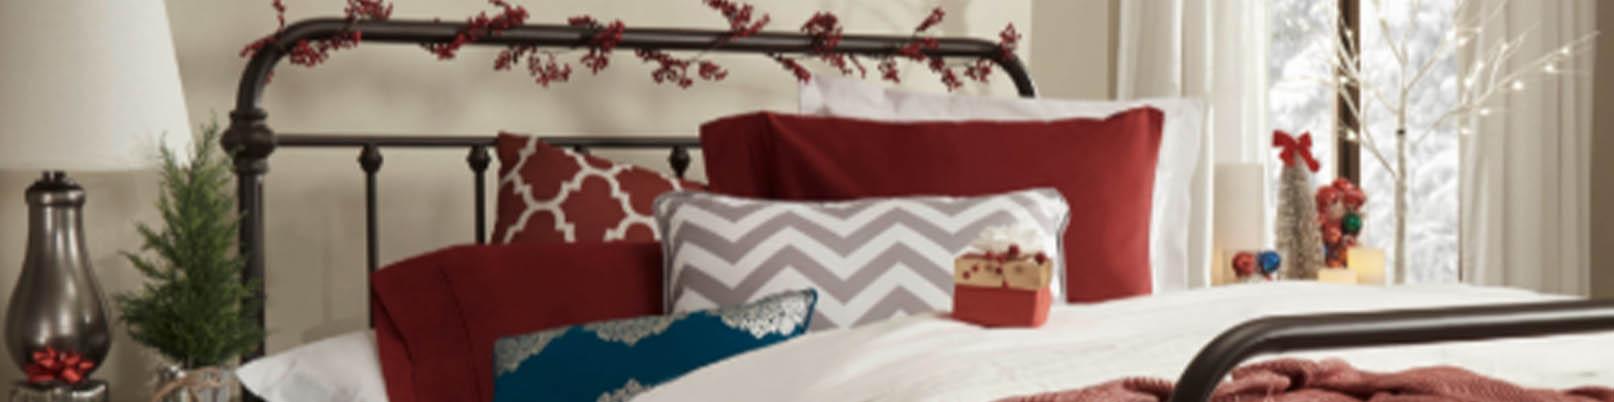 iNSPIRE Q holiday Bedroom decor showcasing headboard